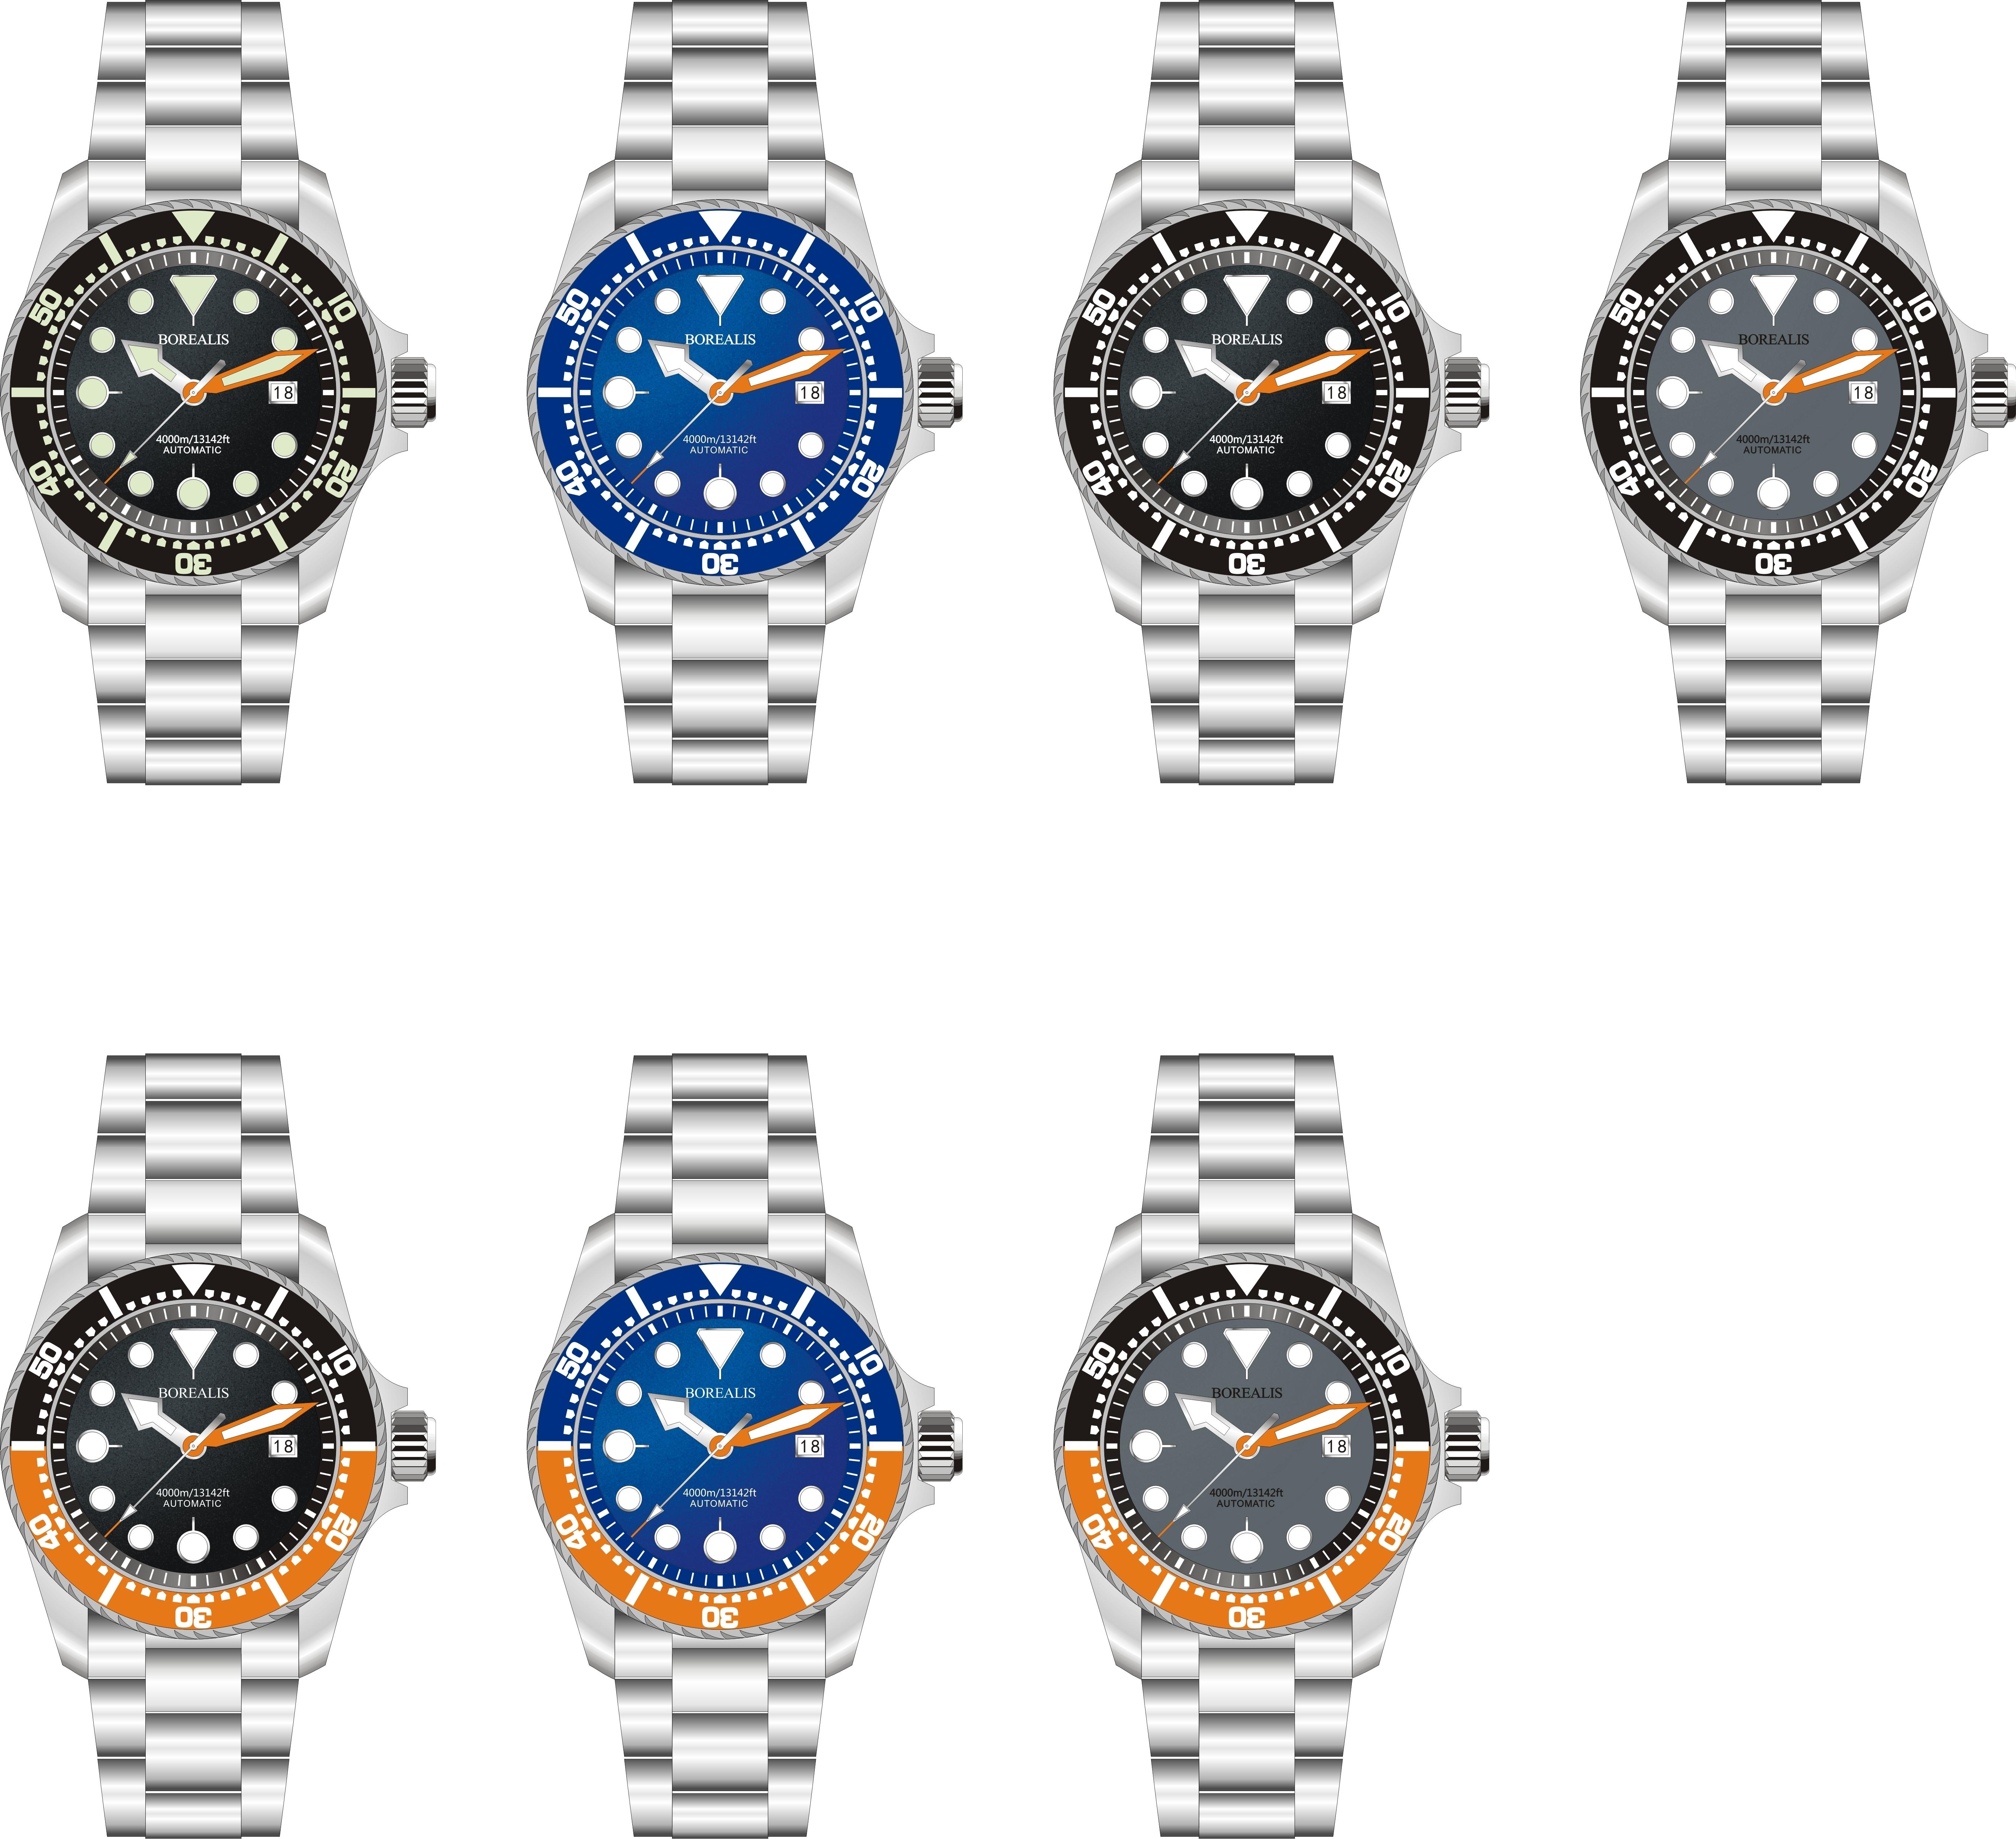 Borealis Seafarer II Stainless Steel Black C3 Sapphire Turbine Style Grip Bezel 4000m Miyota 9015 Automatic Diver Watch